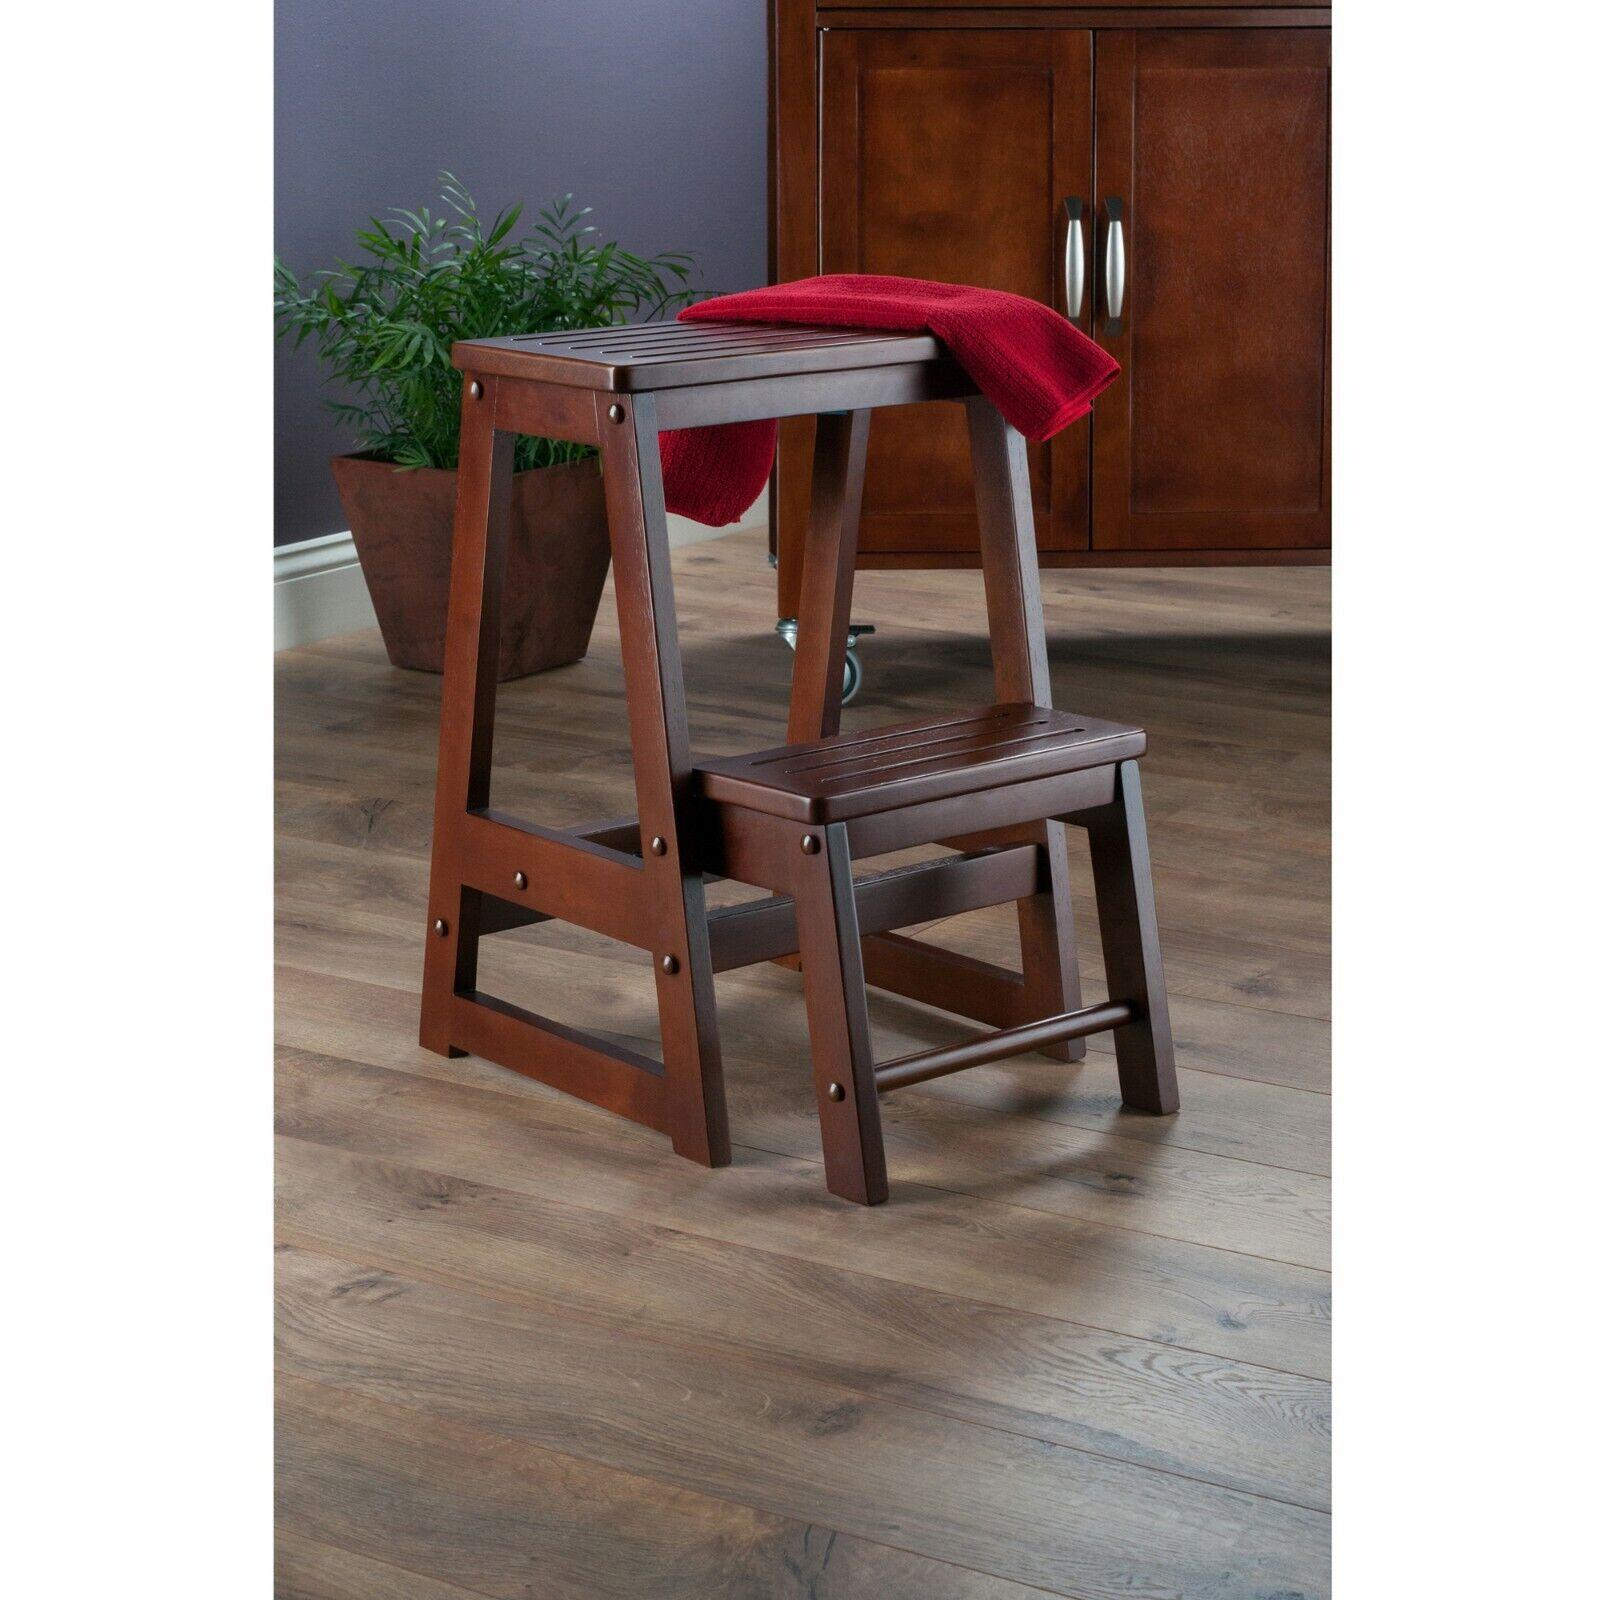 Walnut Folding Step Stool Seat 2 Tier Platform Ladder Kitche